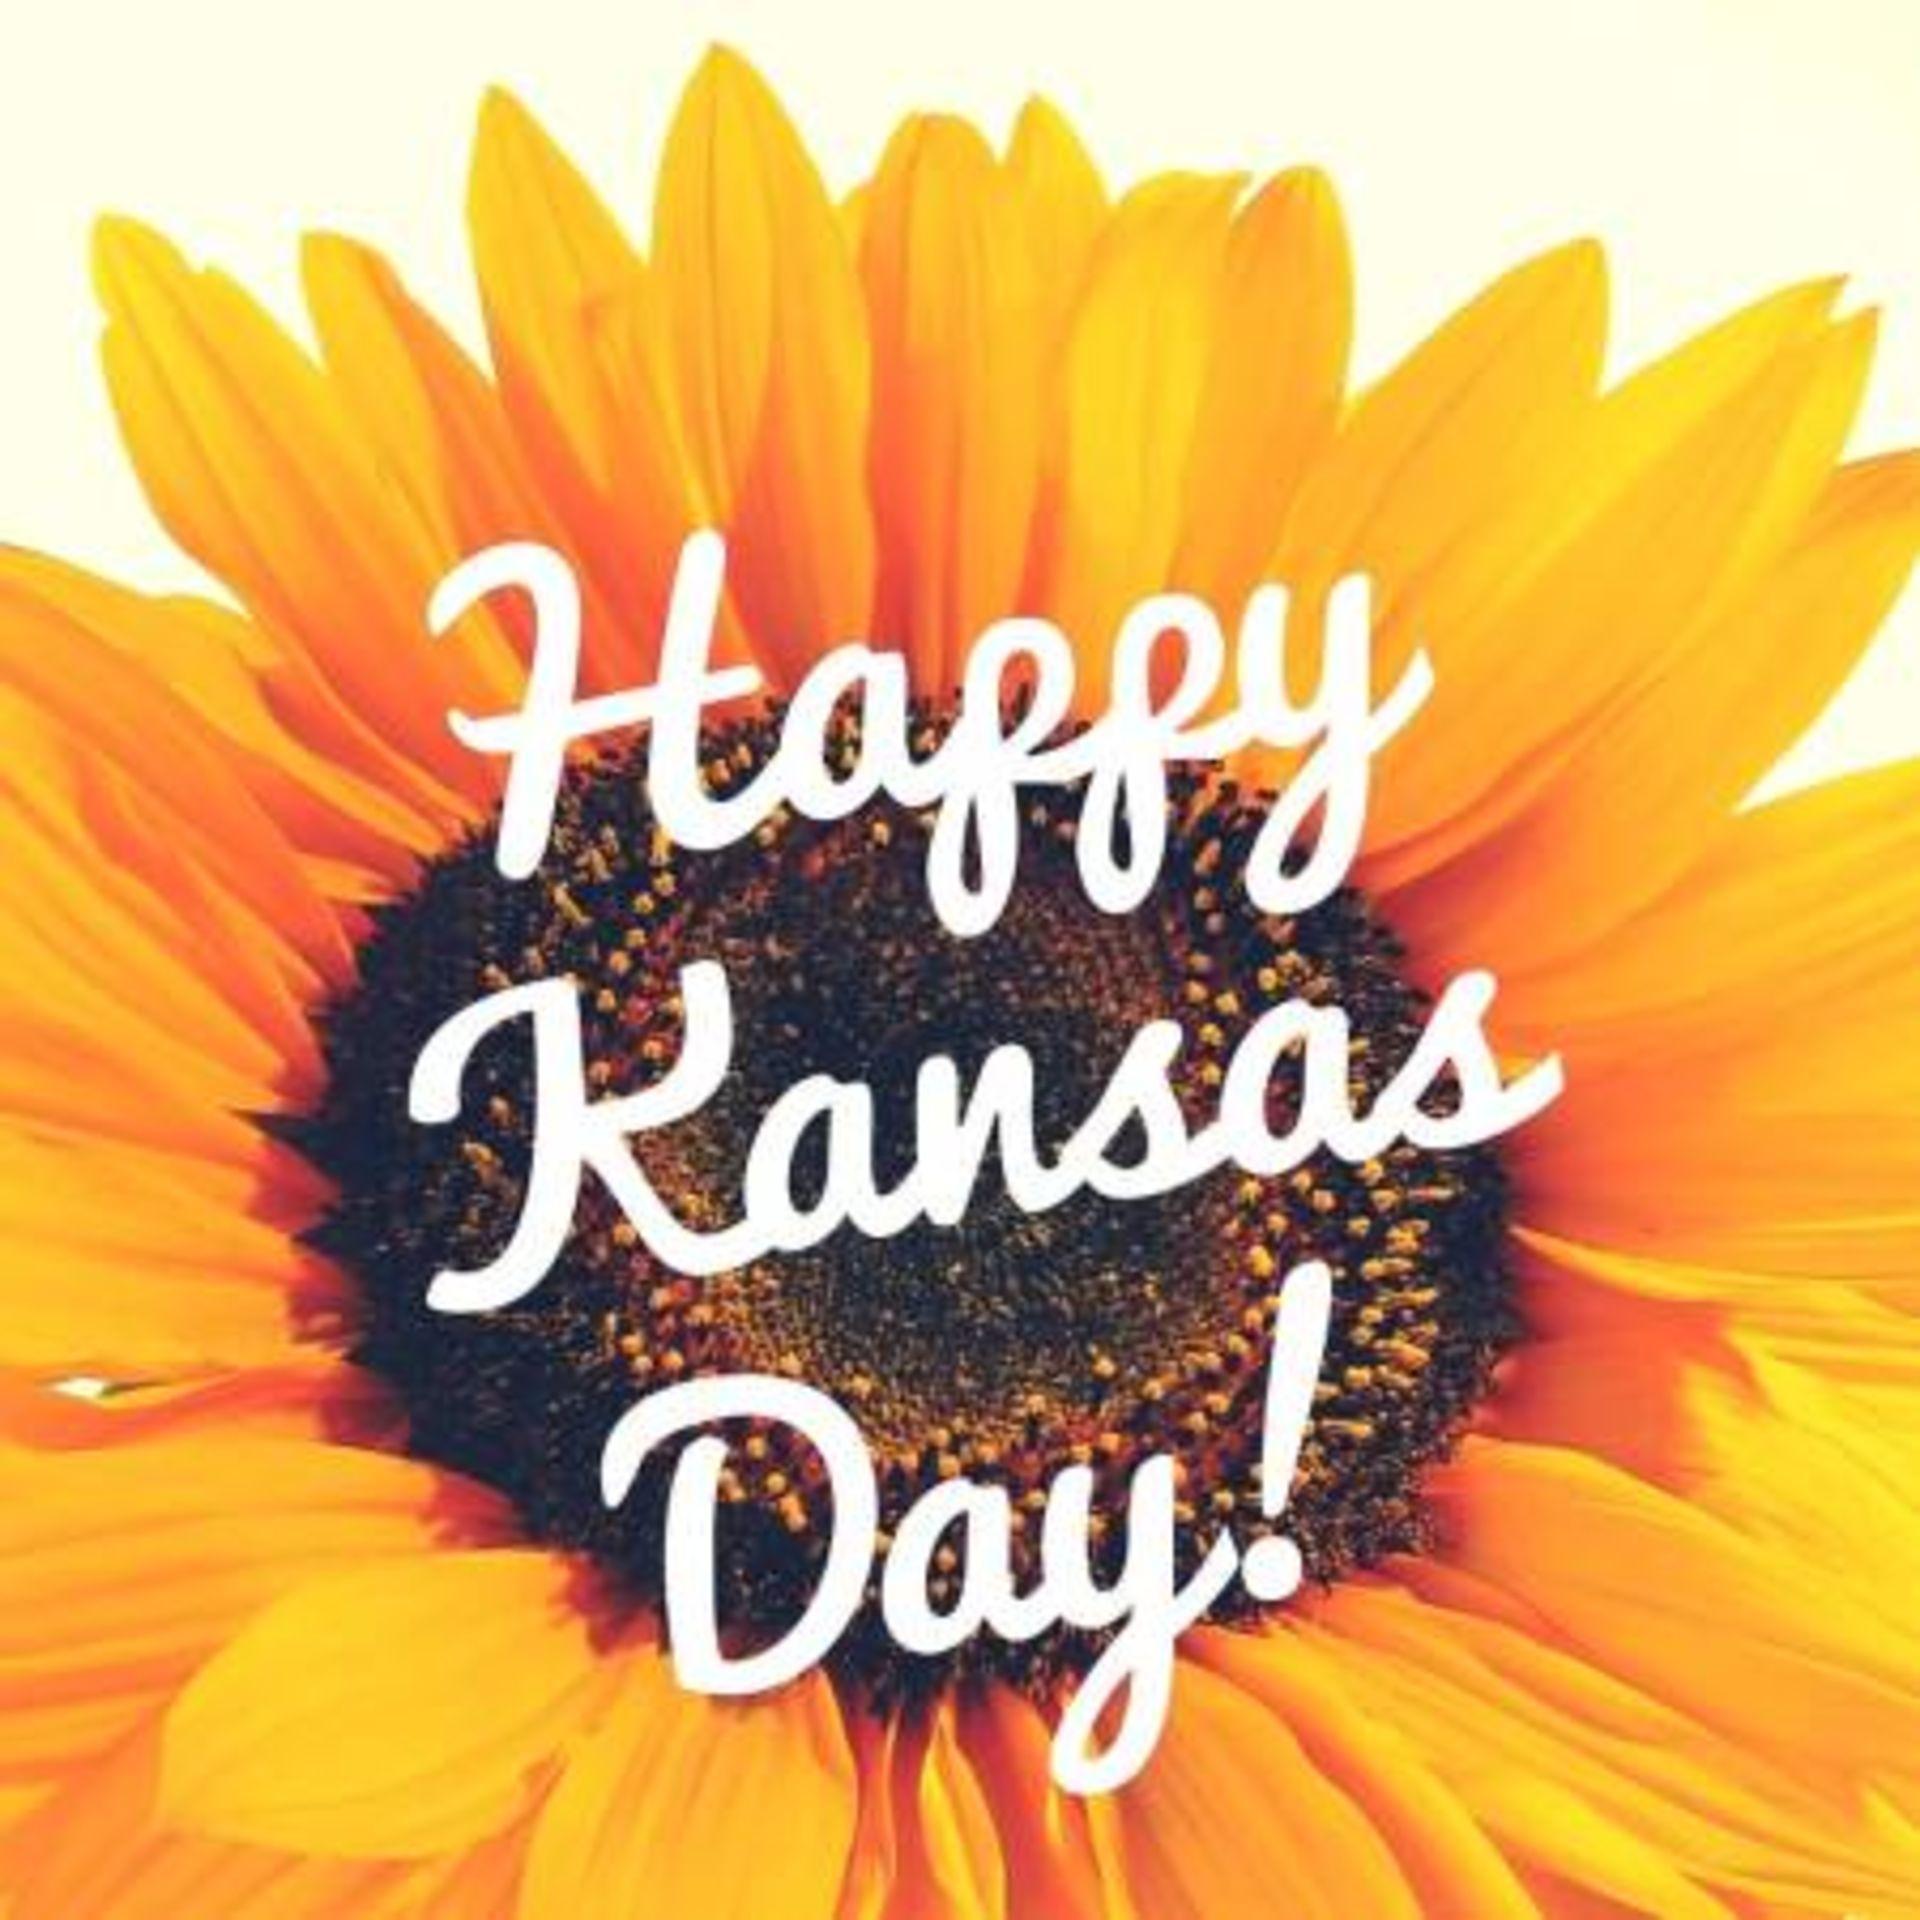 Reasons Why I Love Living in Kansas